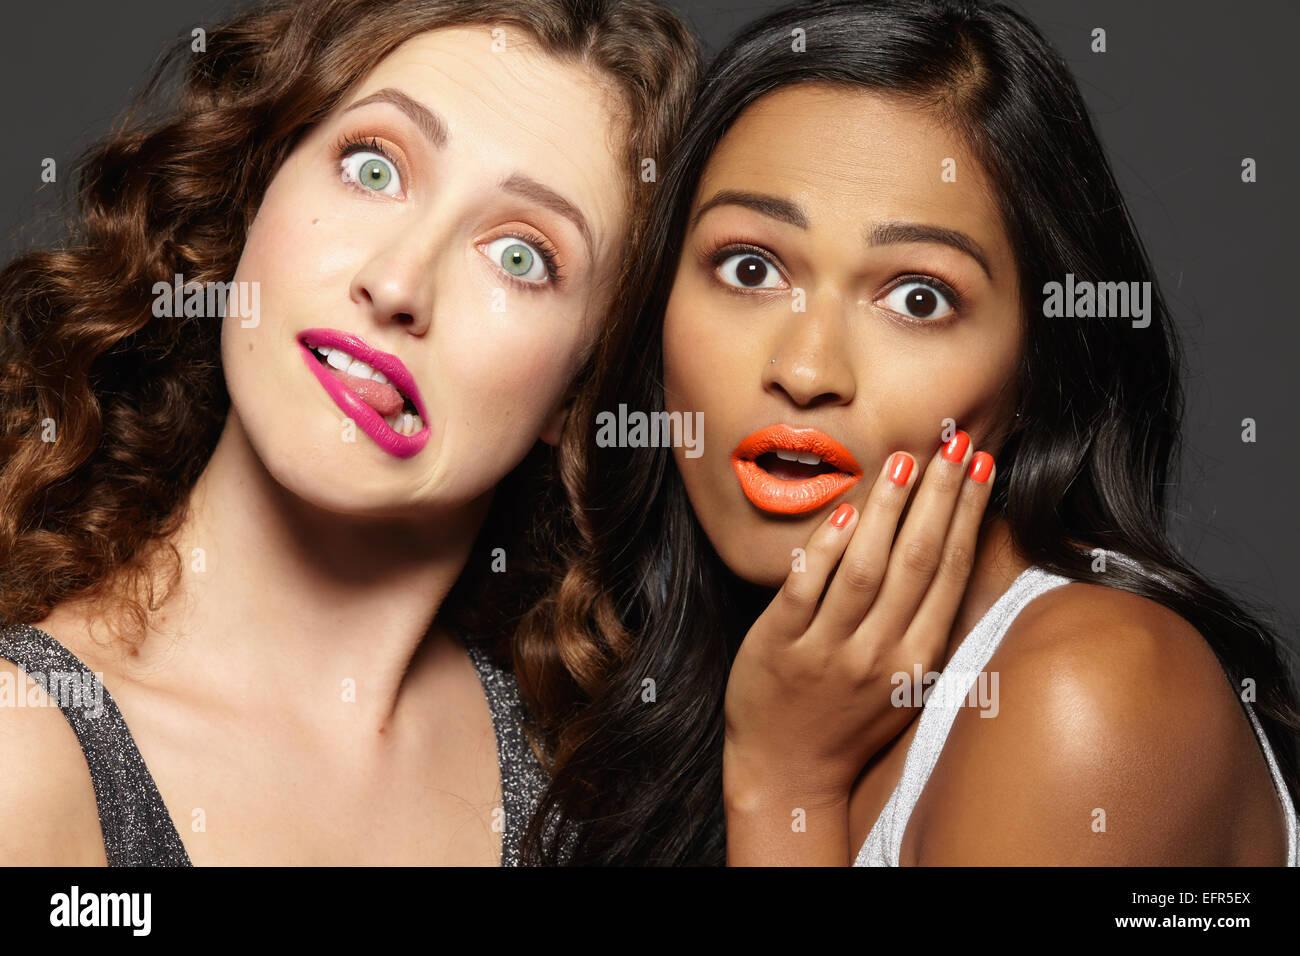 Female models making faces - Stock Image